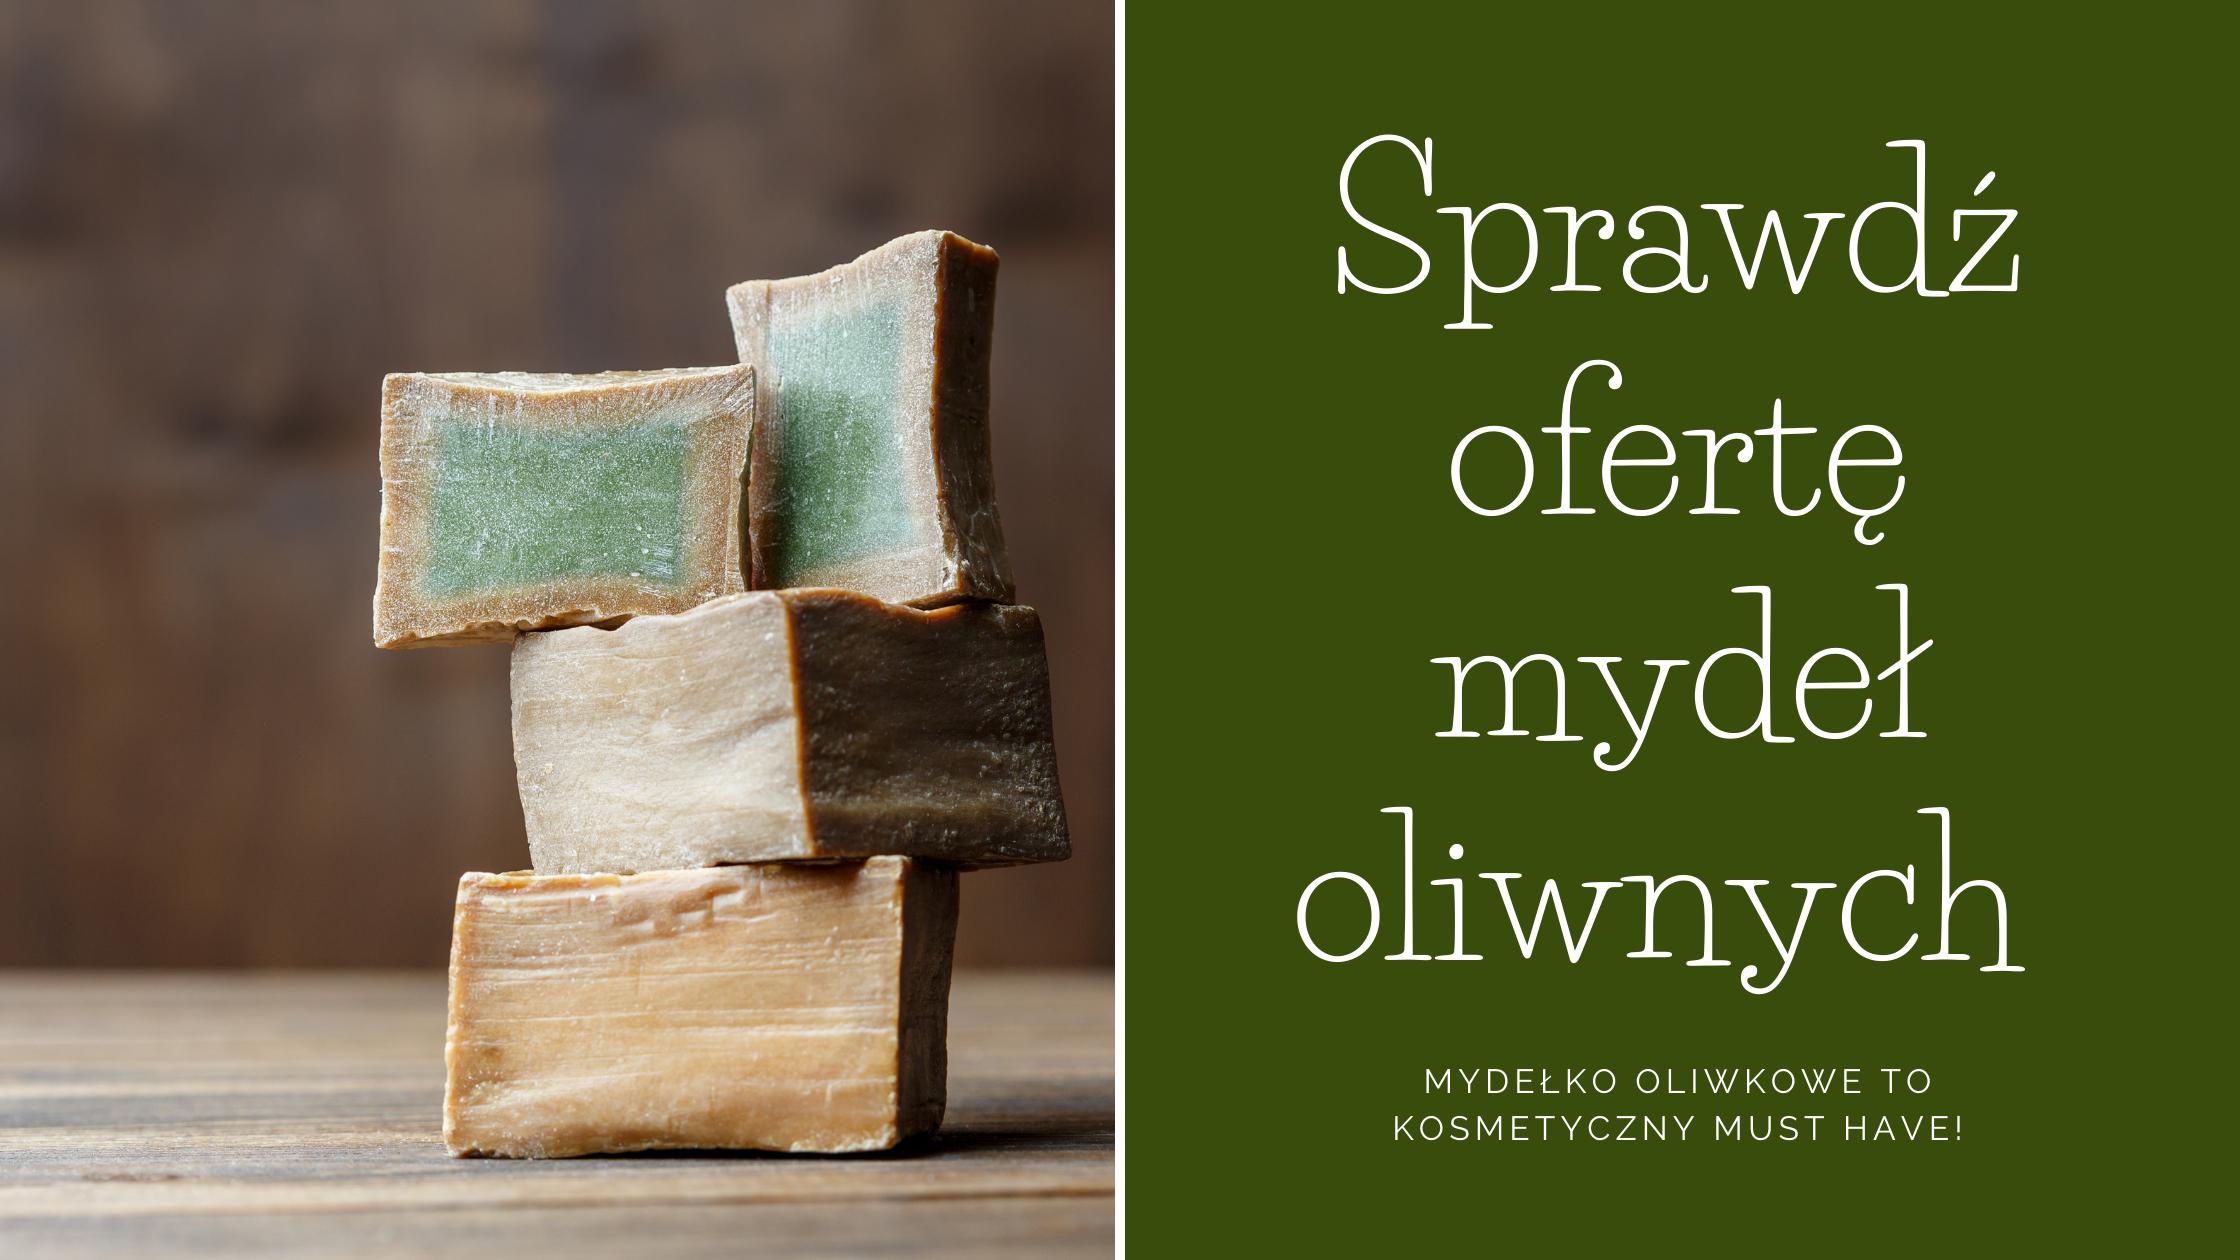 mydło oliwne